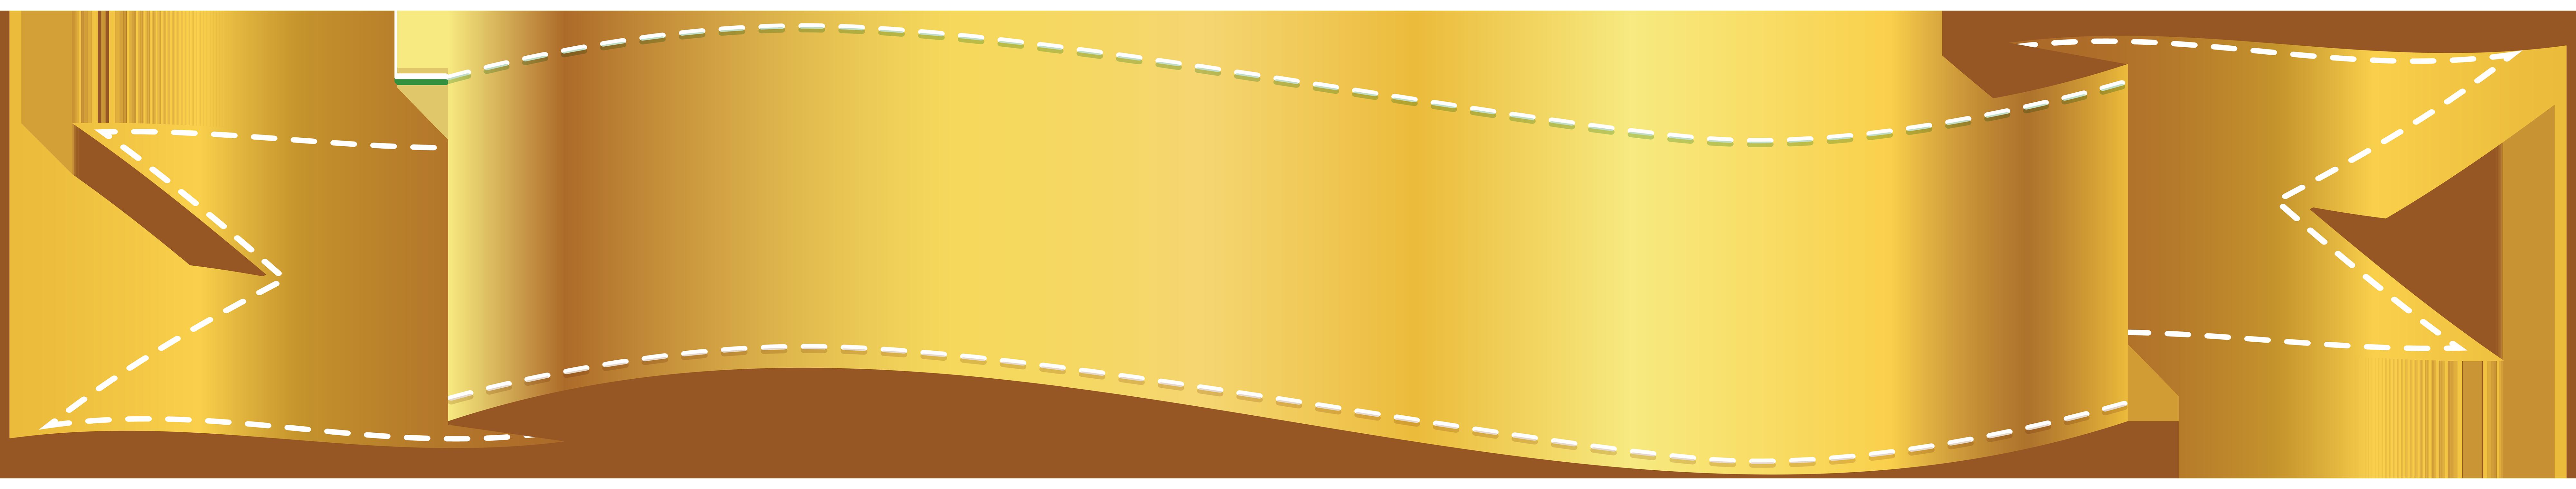 Blank blue silver badge ribbon star clipart psd vector royalty free download Golden Banner PNG Clip Art Image | Laços | Pinterest | Art images ... vector royalty free download